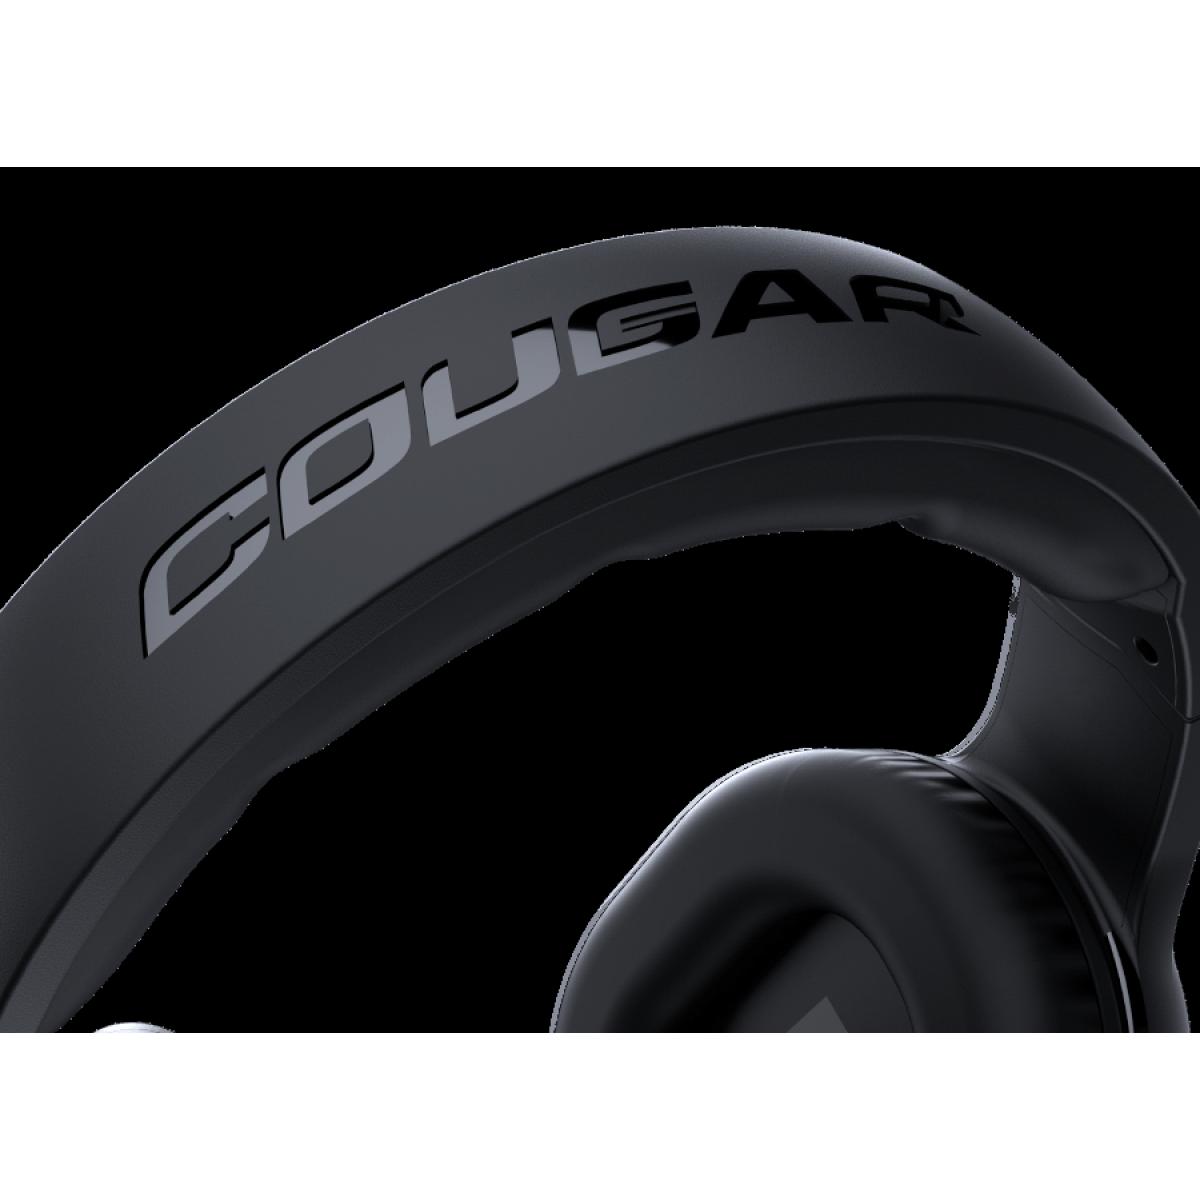 Headset Gamer Cougar HX330, 3.5mm, Black, 3H250P50B.0001